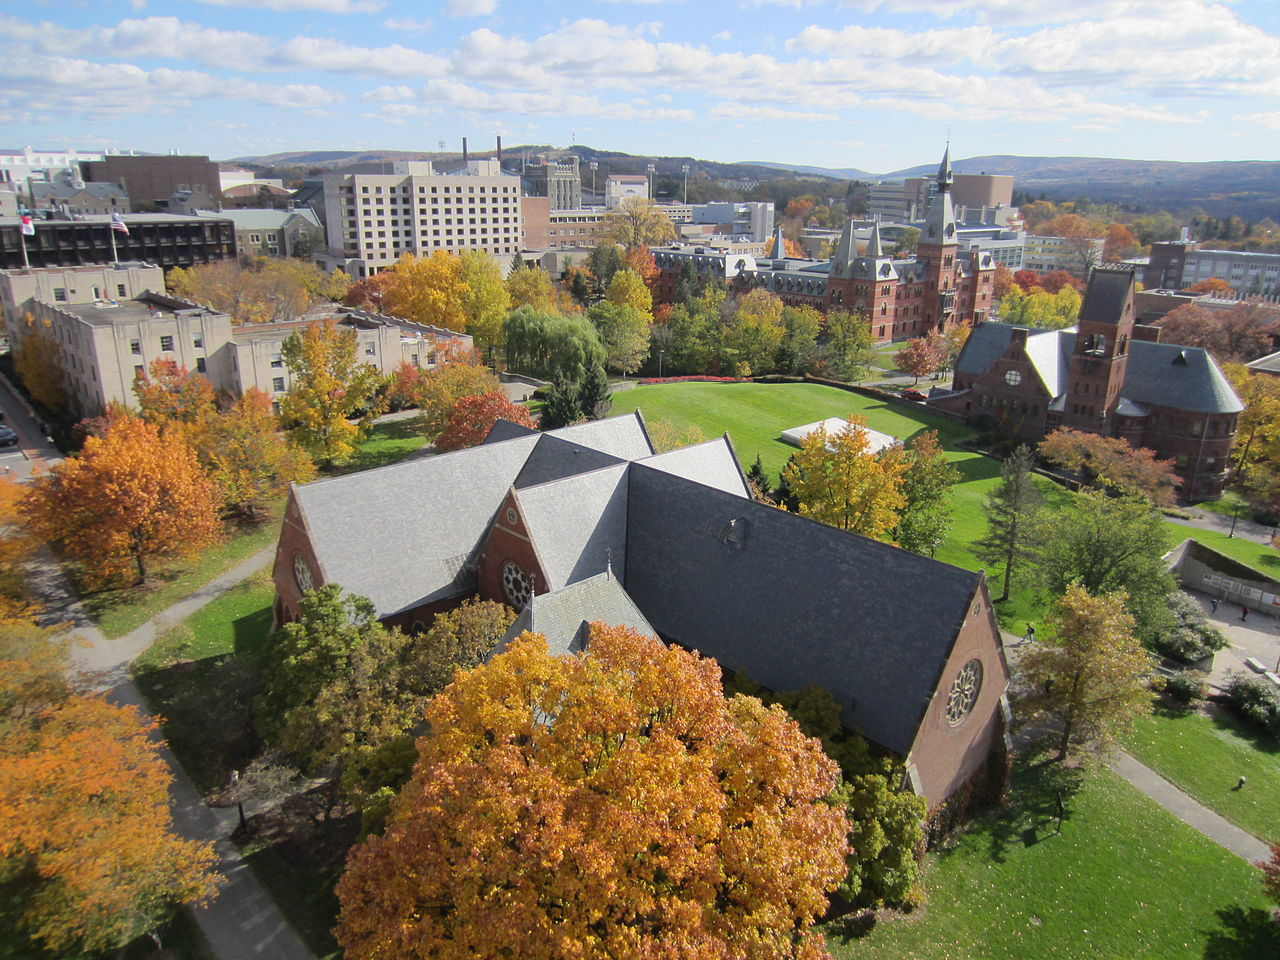 File:Cornell University from McGraw Tower.JPG